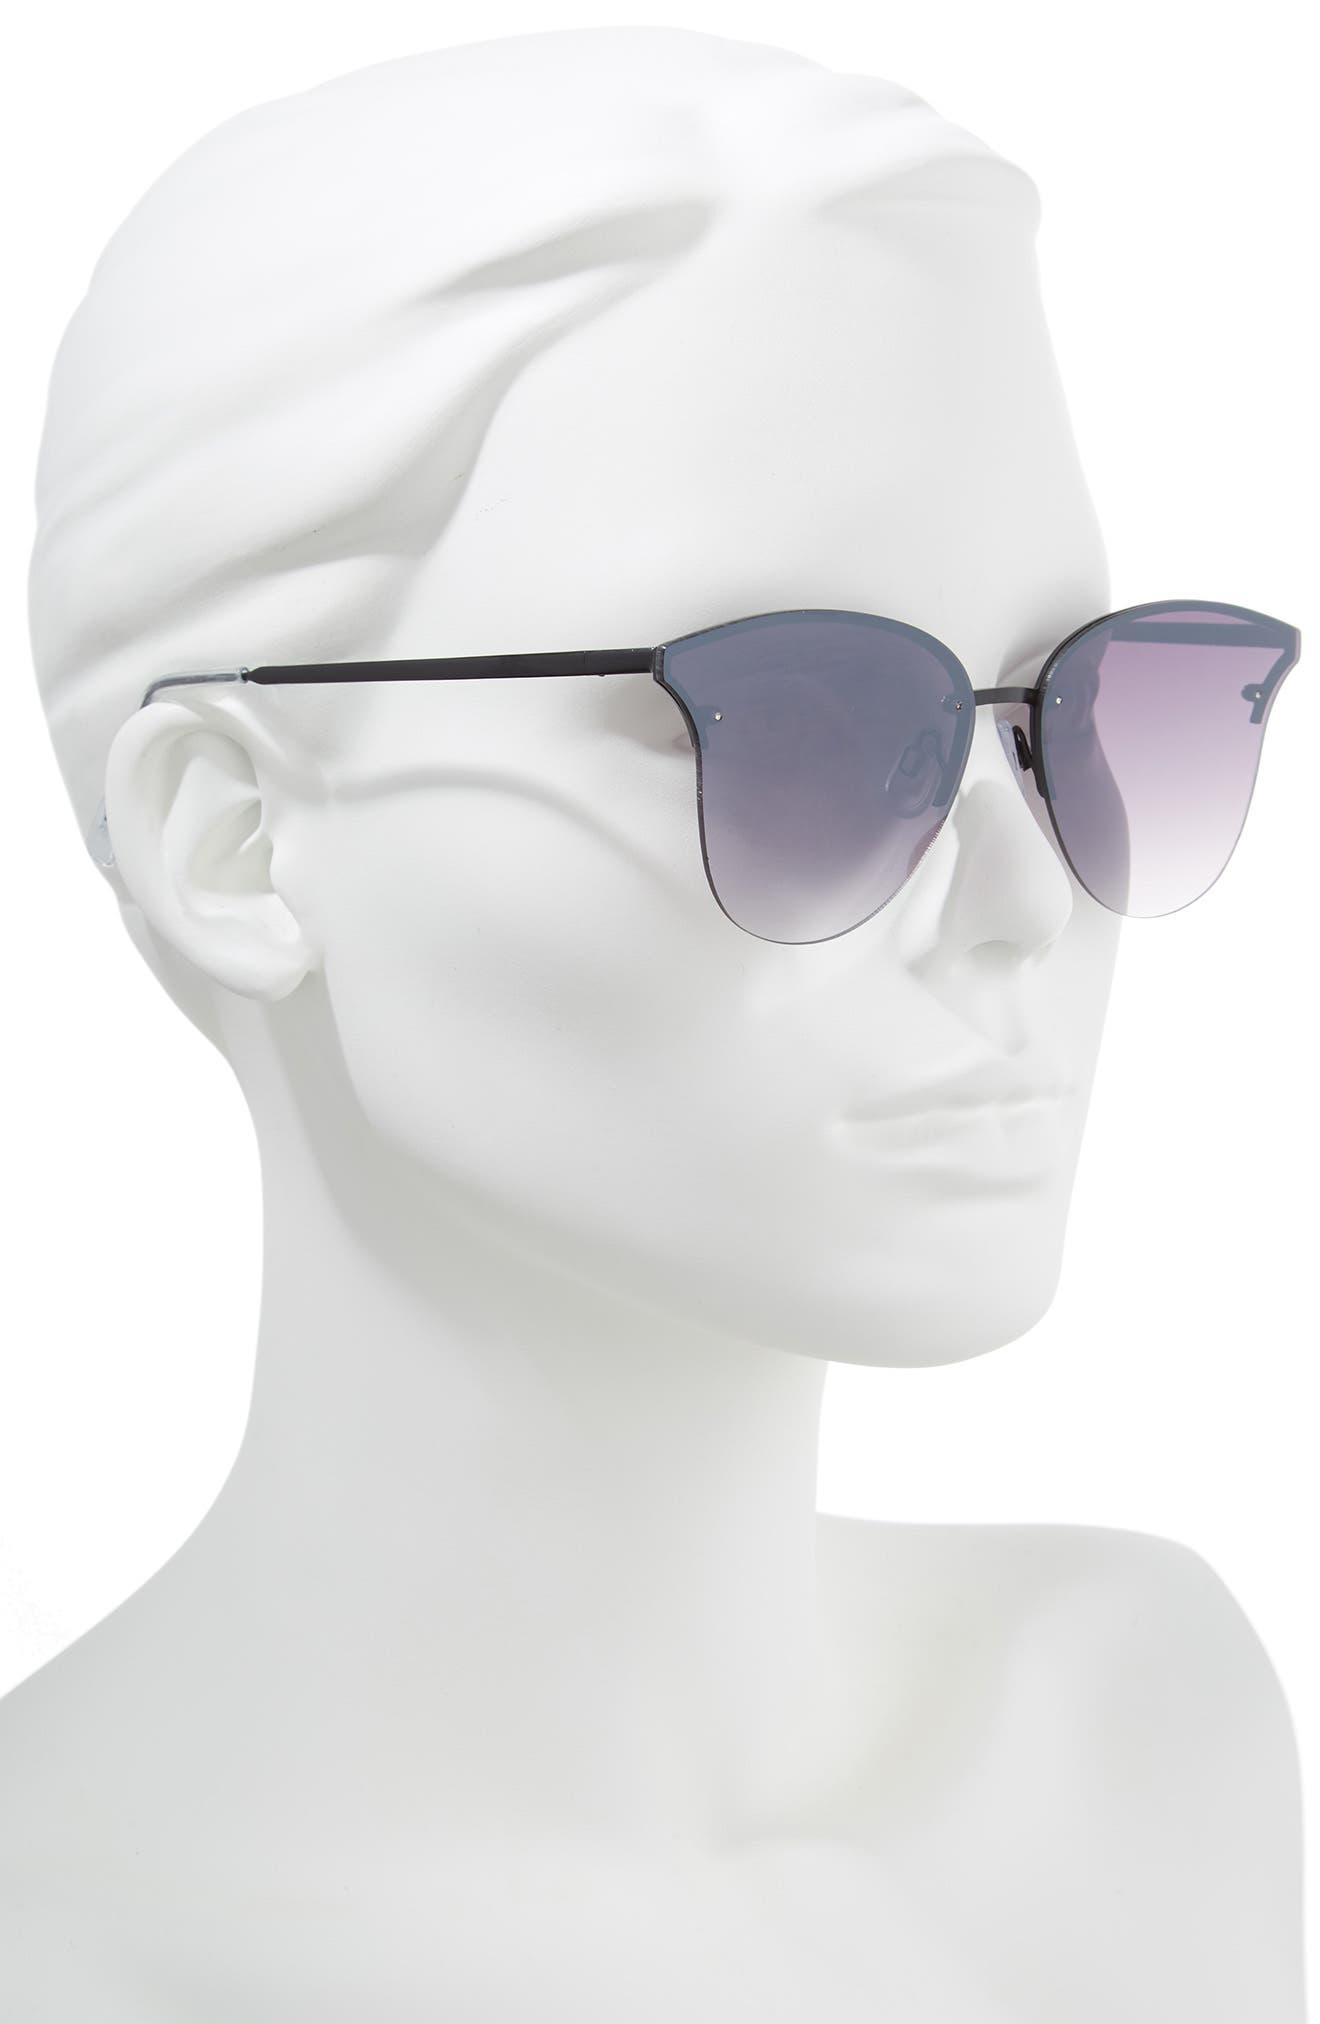 61mm Rimless Cat Eye Sunglasses,                             Alternate thumbnail 2, color,                             Black/ Black